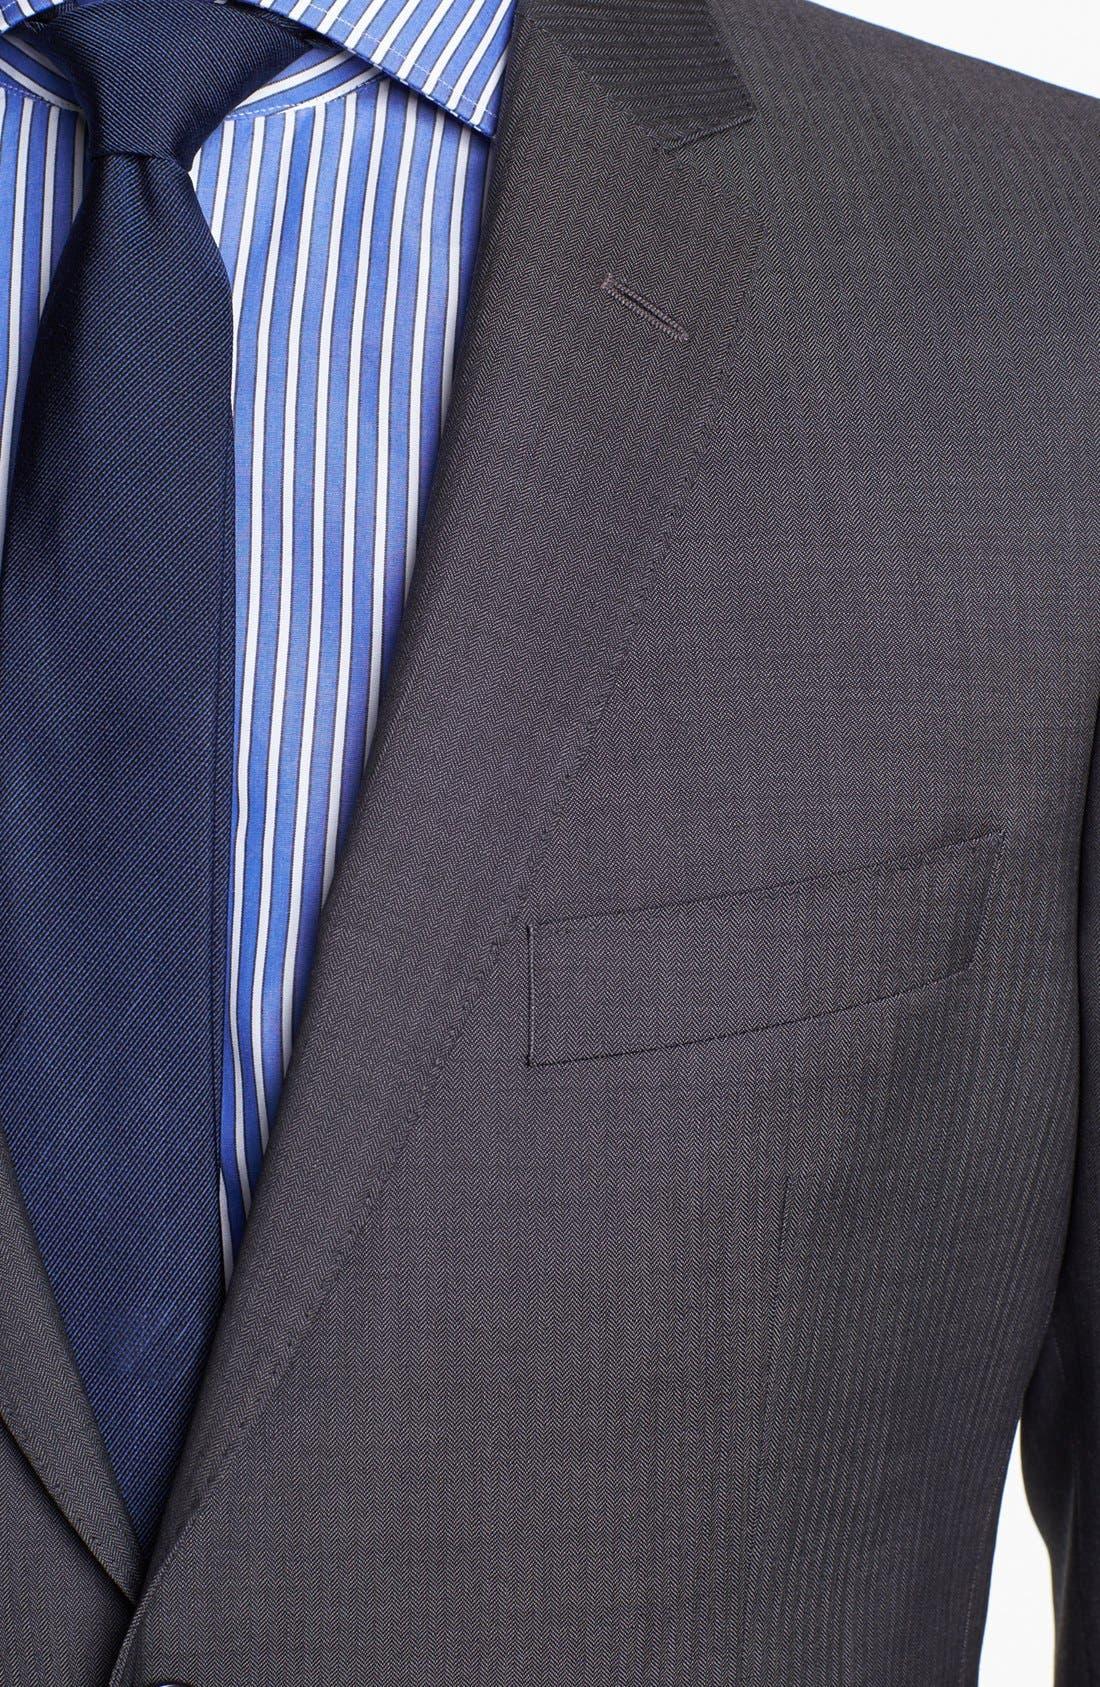 Alternate Image 2  - BOSS HUGO BOSS 'Edison/Power' Classic Fit Wool Suit